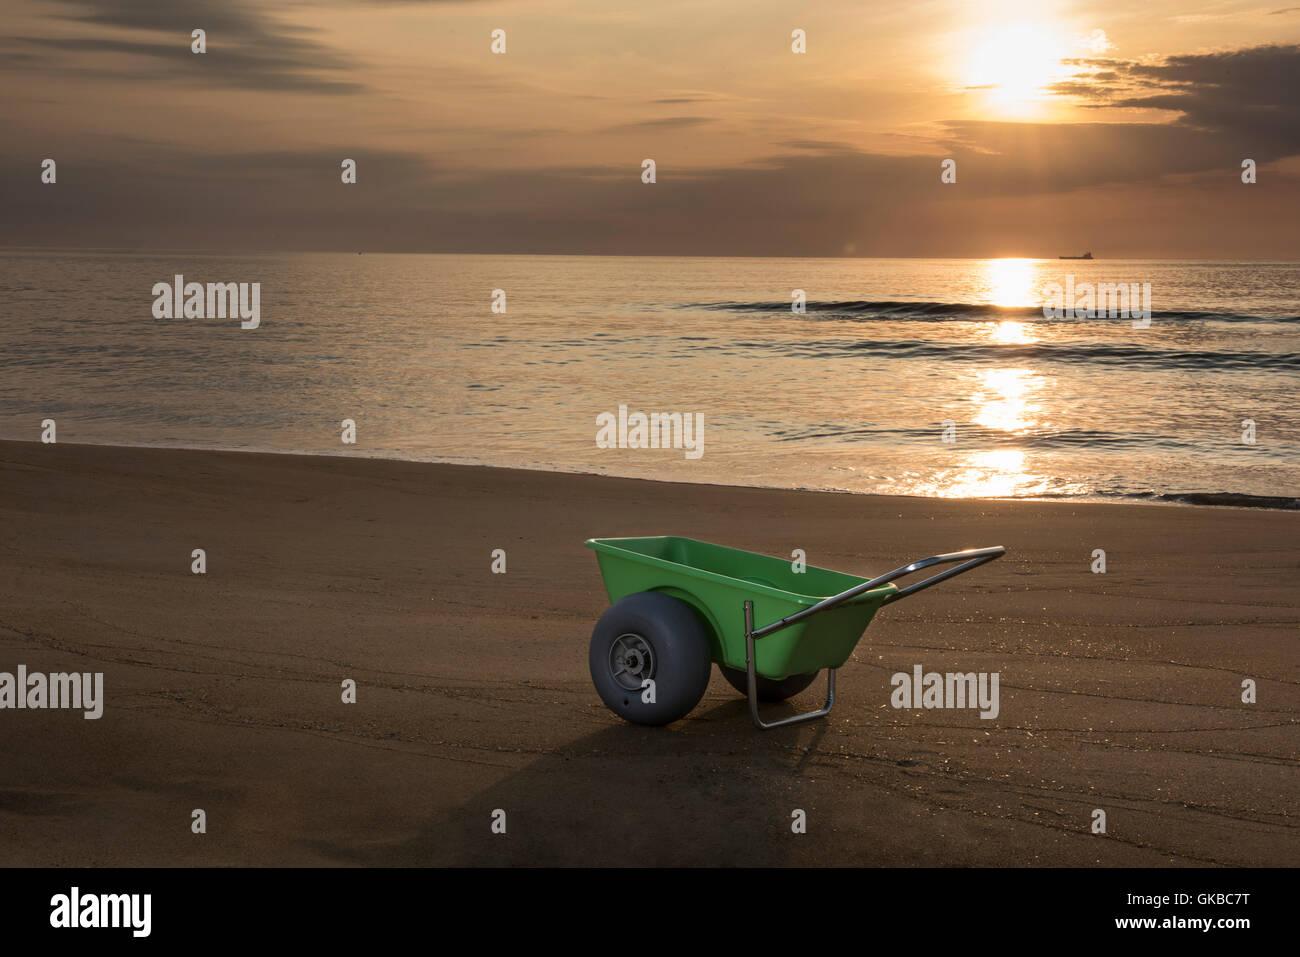 Green beach cart on the beach at sunrise, Virginia Beach, Virginia - Stock Image